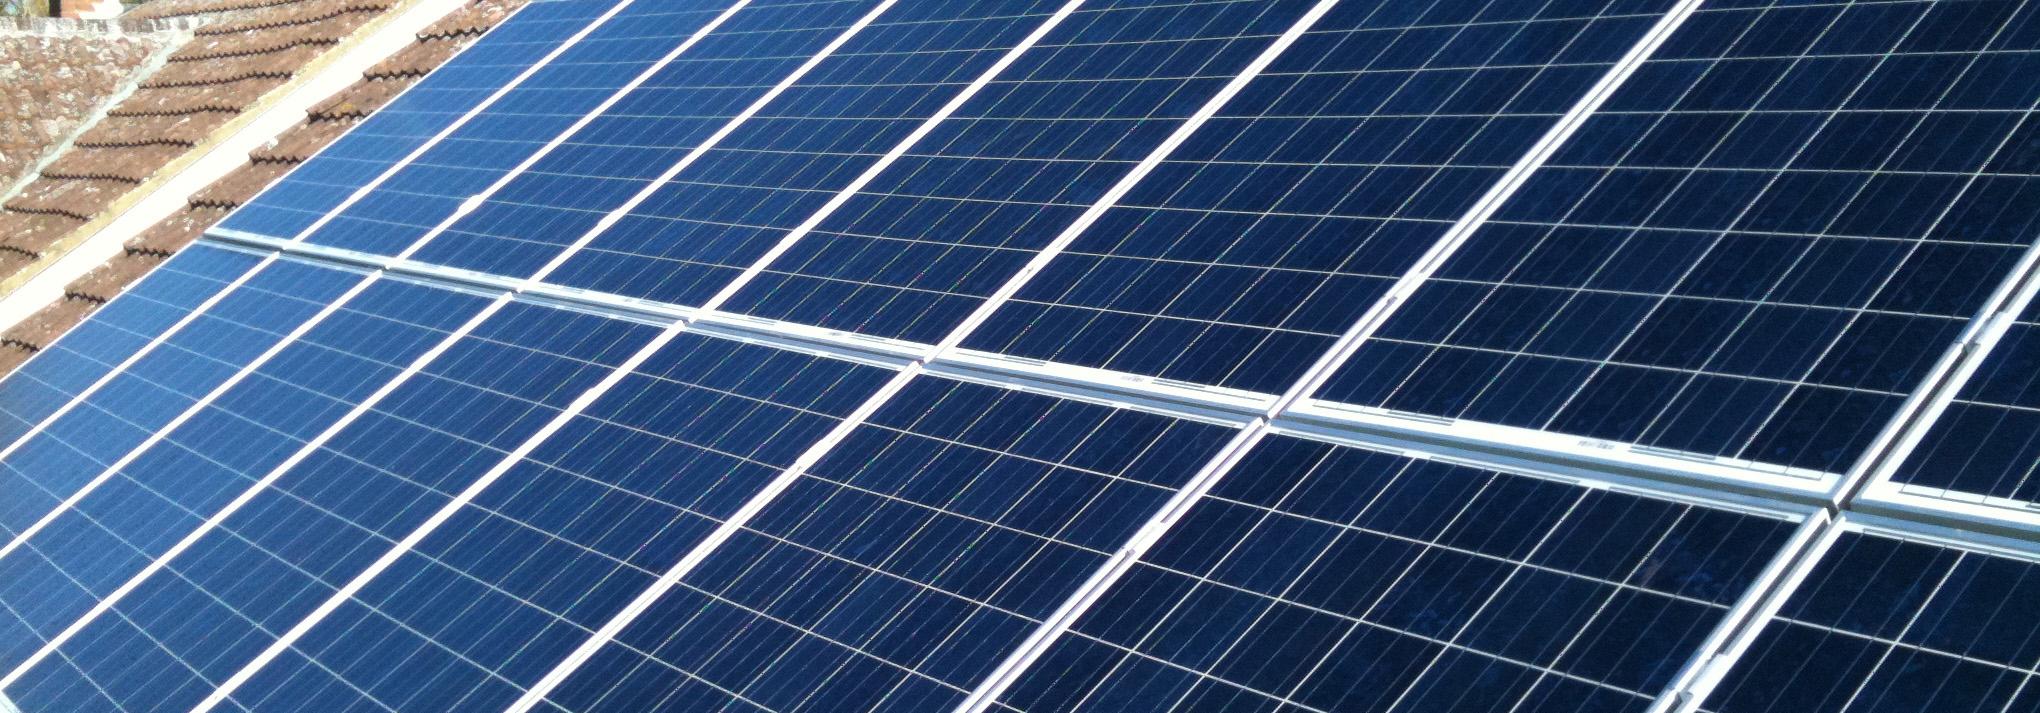 how do solar panels generate electricity  | sunnyfuturesolar.co.uk